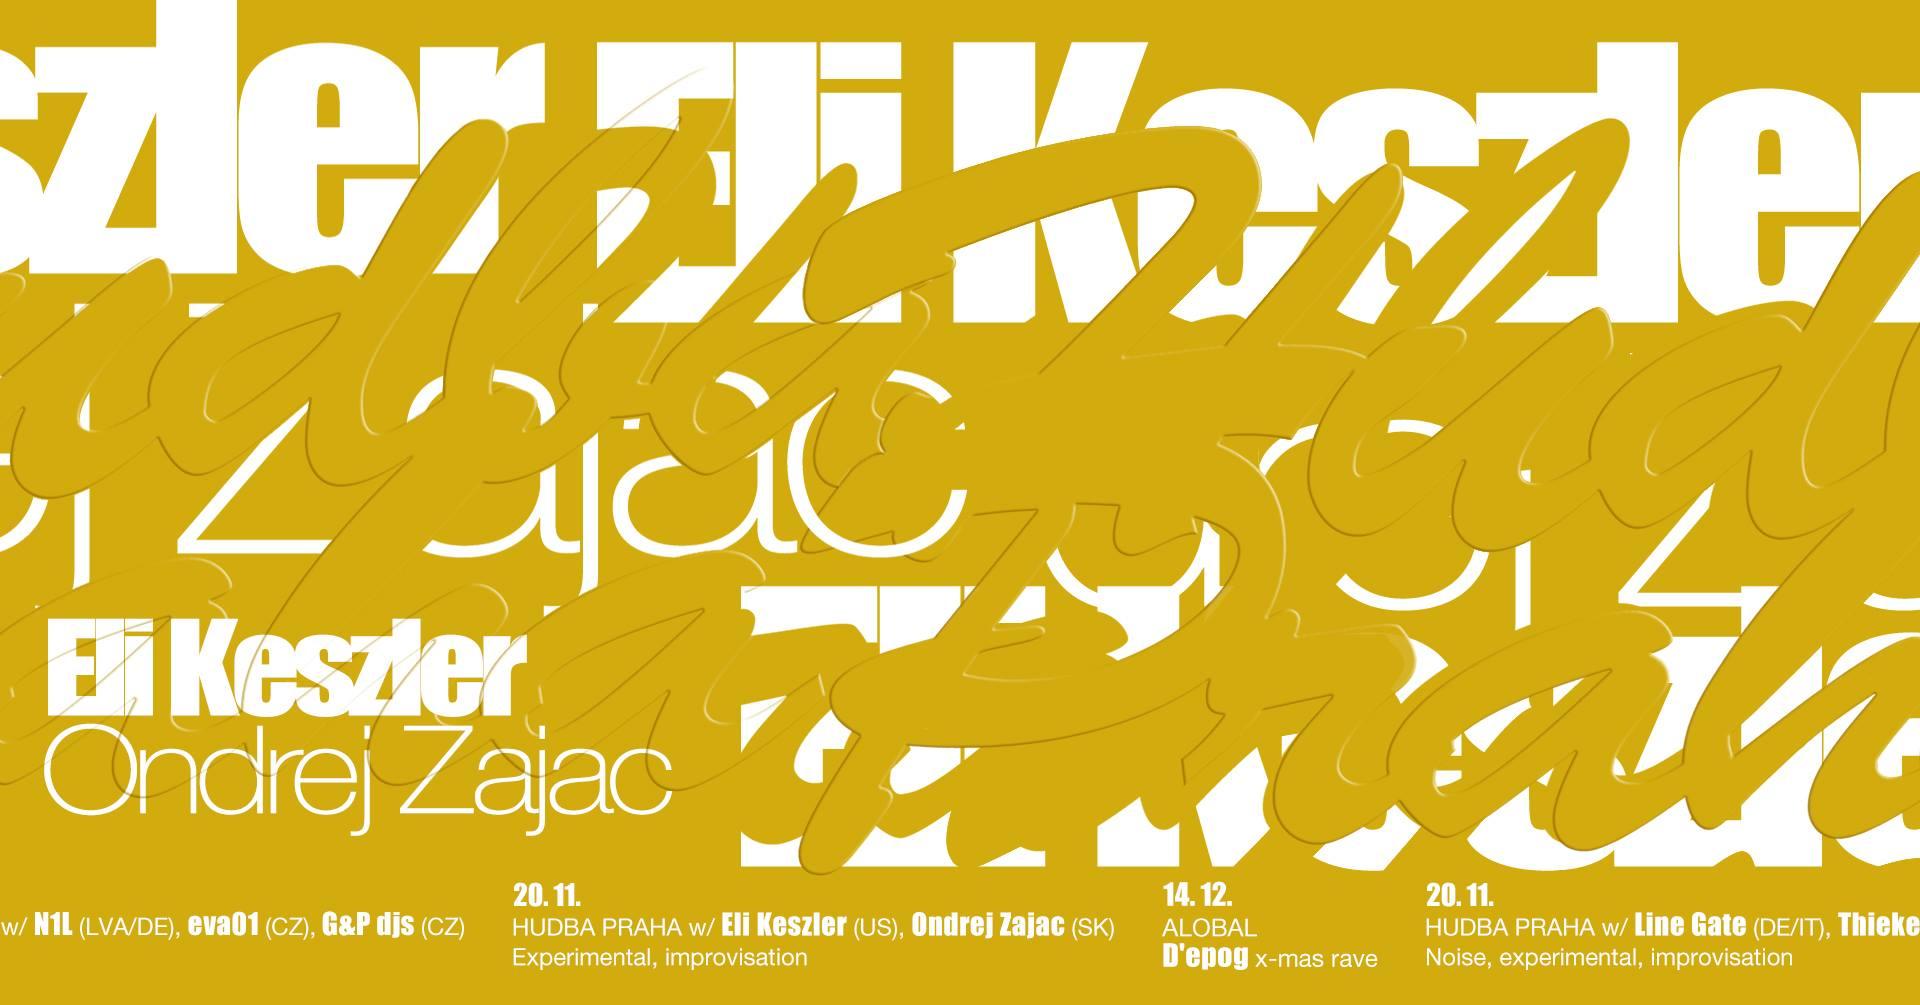 ÚT / 20.11. / 21.00 / HUDBA PRAHA w/ Eli Keszler (US), Ondrej Zajac (SK) / koncert, dj set